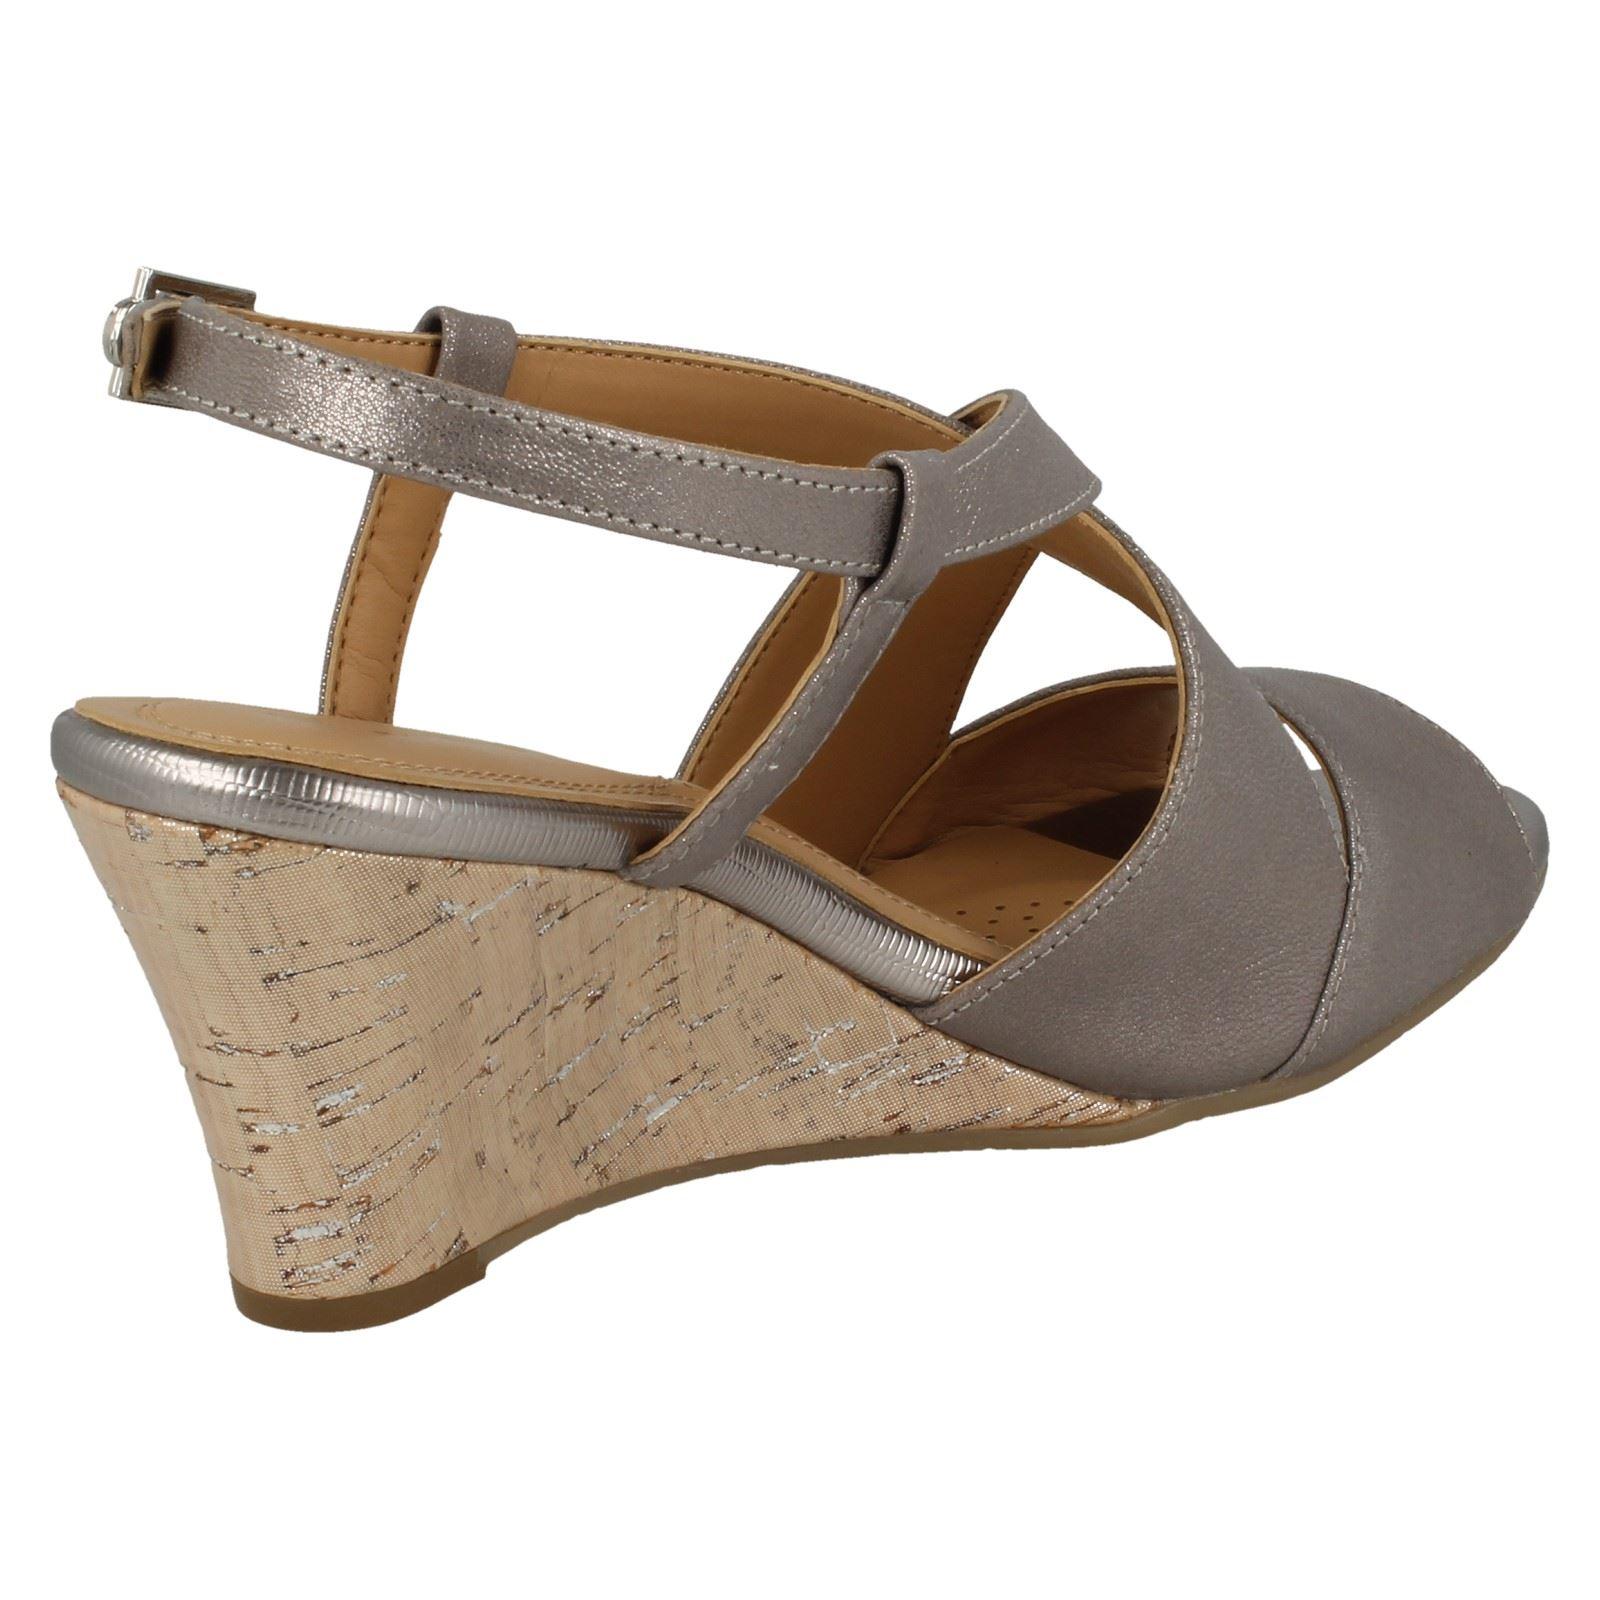 Ladies-Van-Dal-Cross-Strap-Wedged-Sandal-Allora thumbnail 26